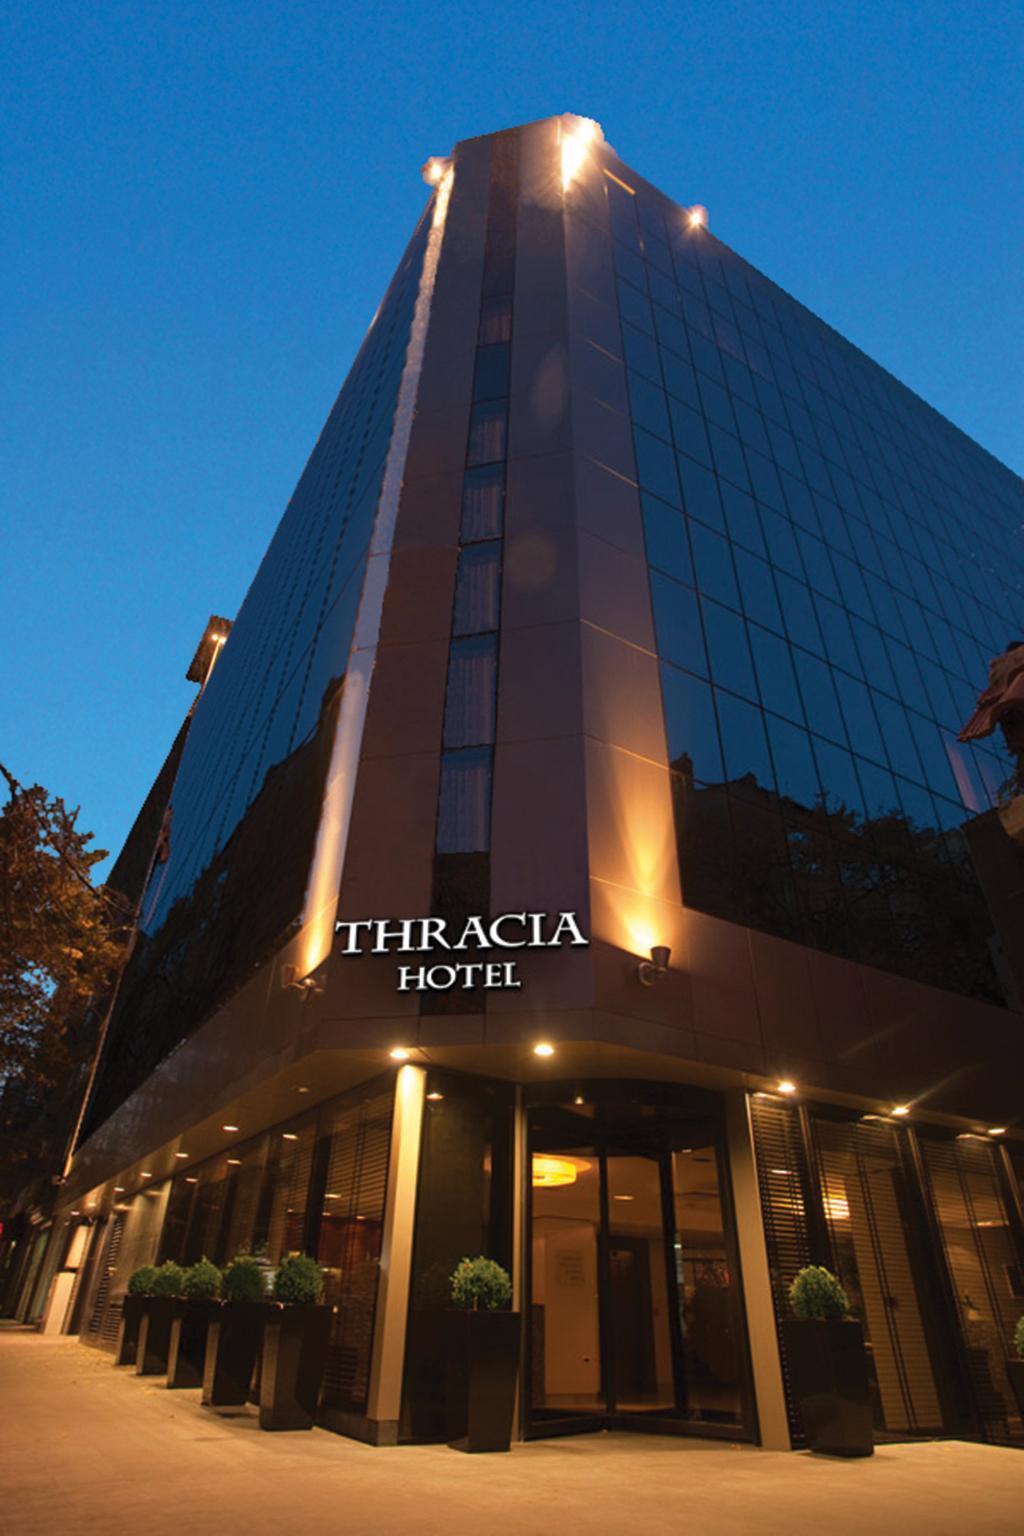 Thracia Hotel